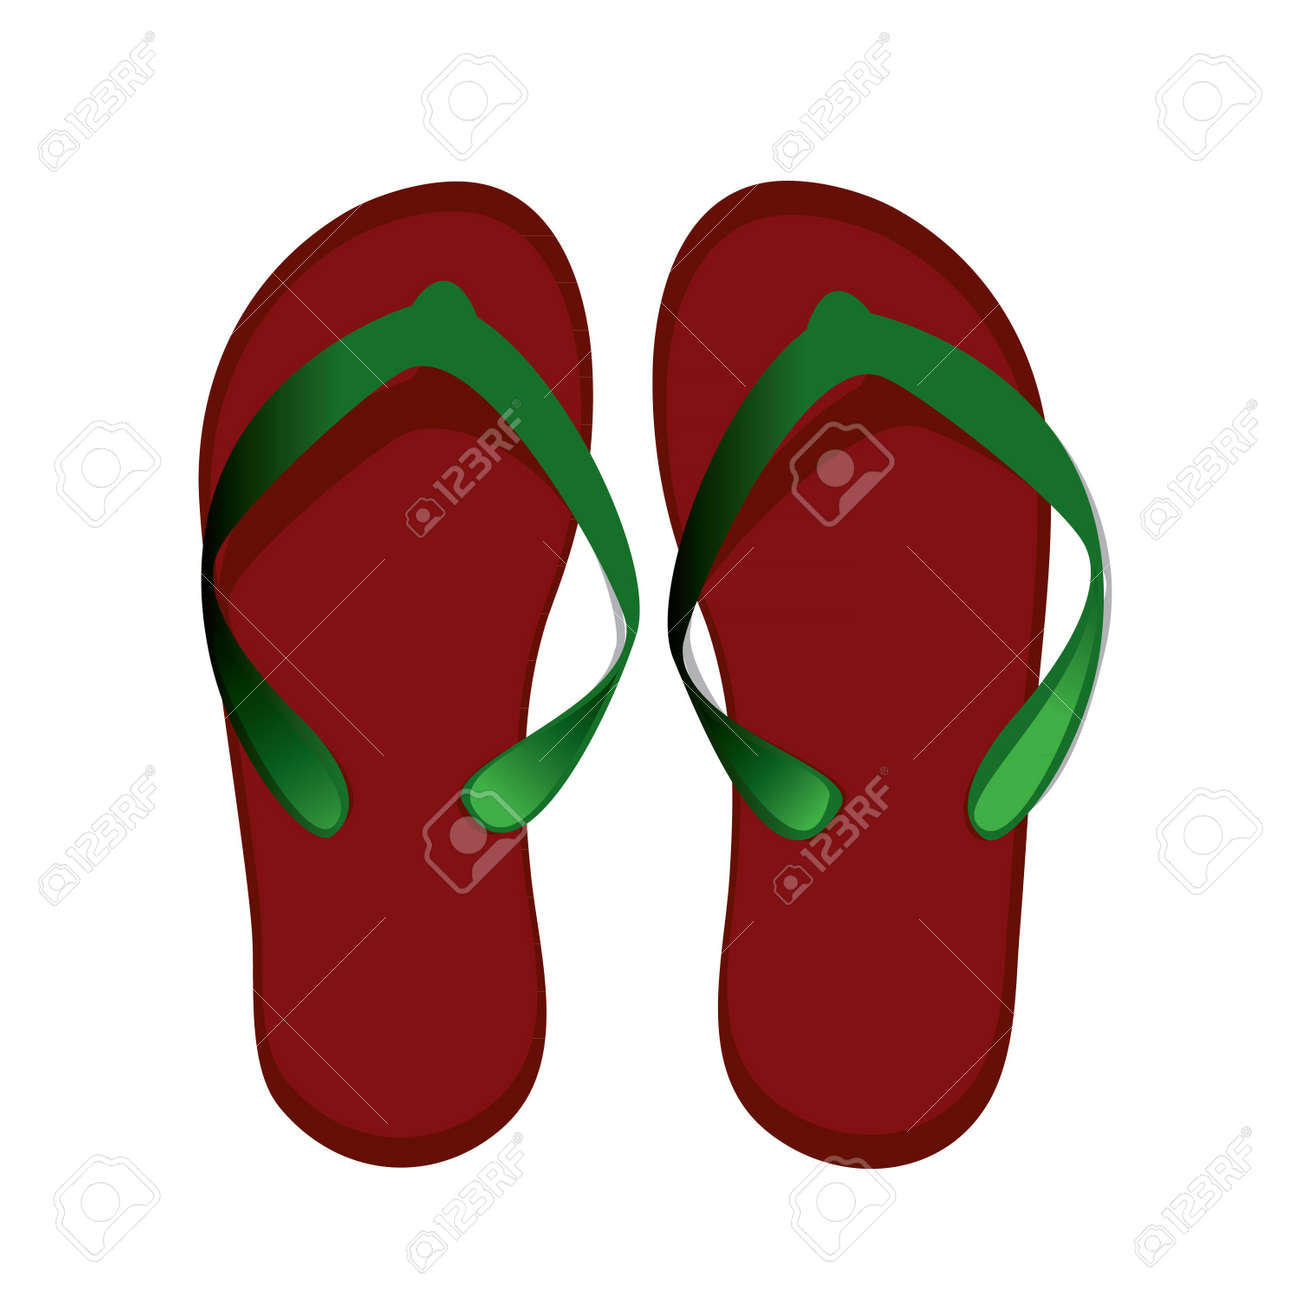 red women's flip-flops for the beach Stock Vector - 20472413